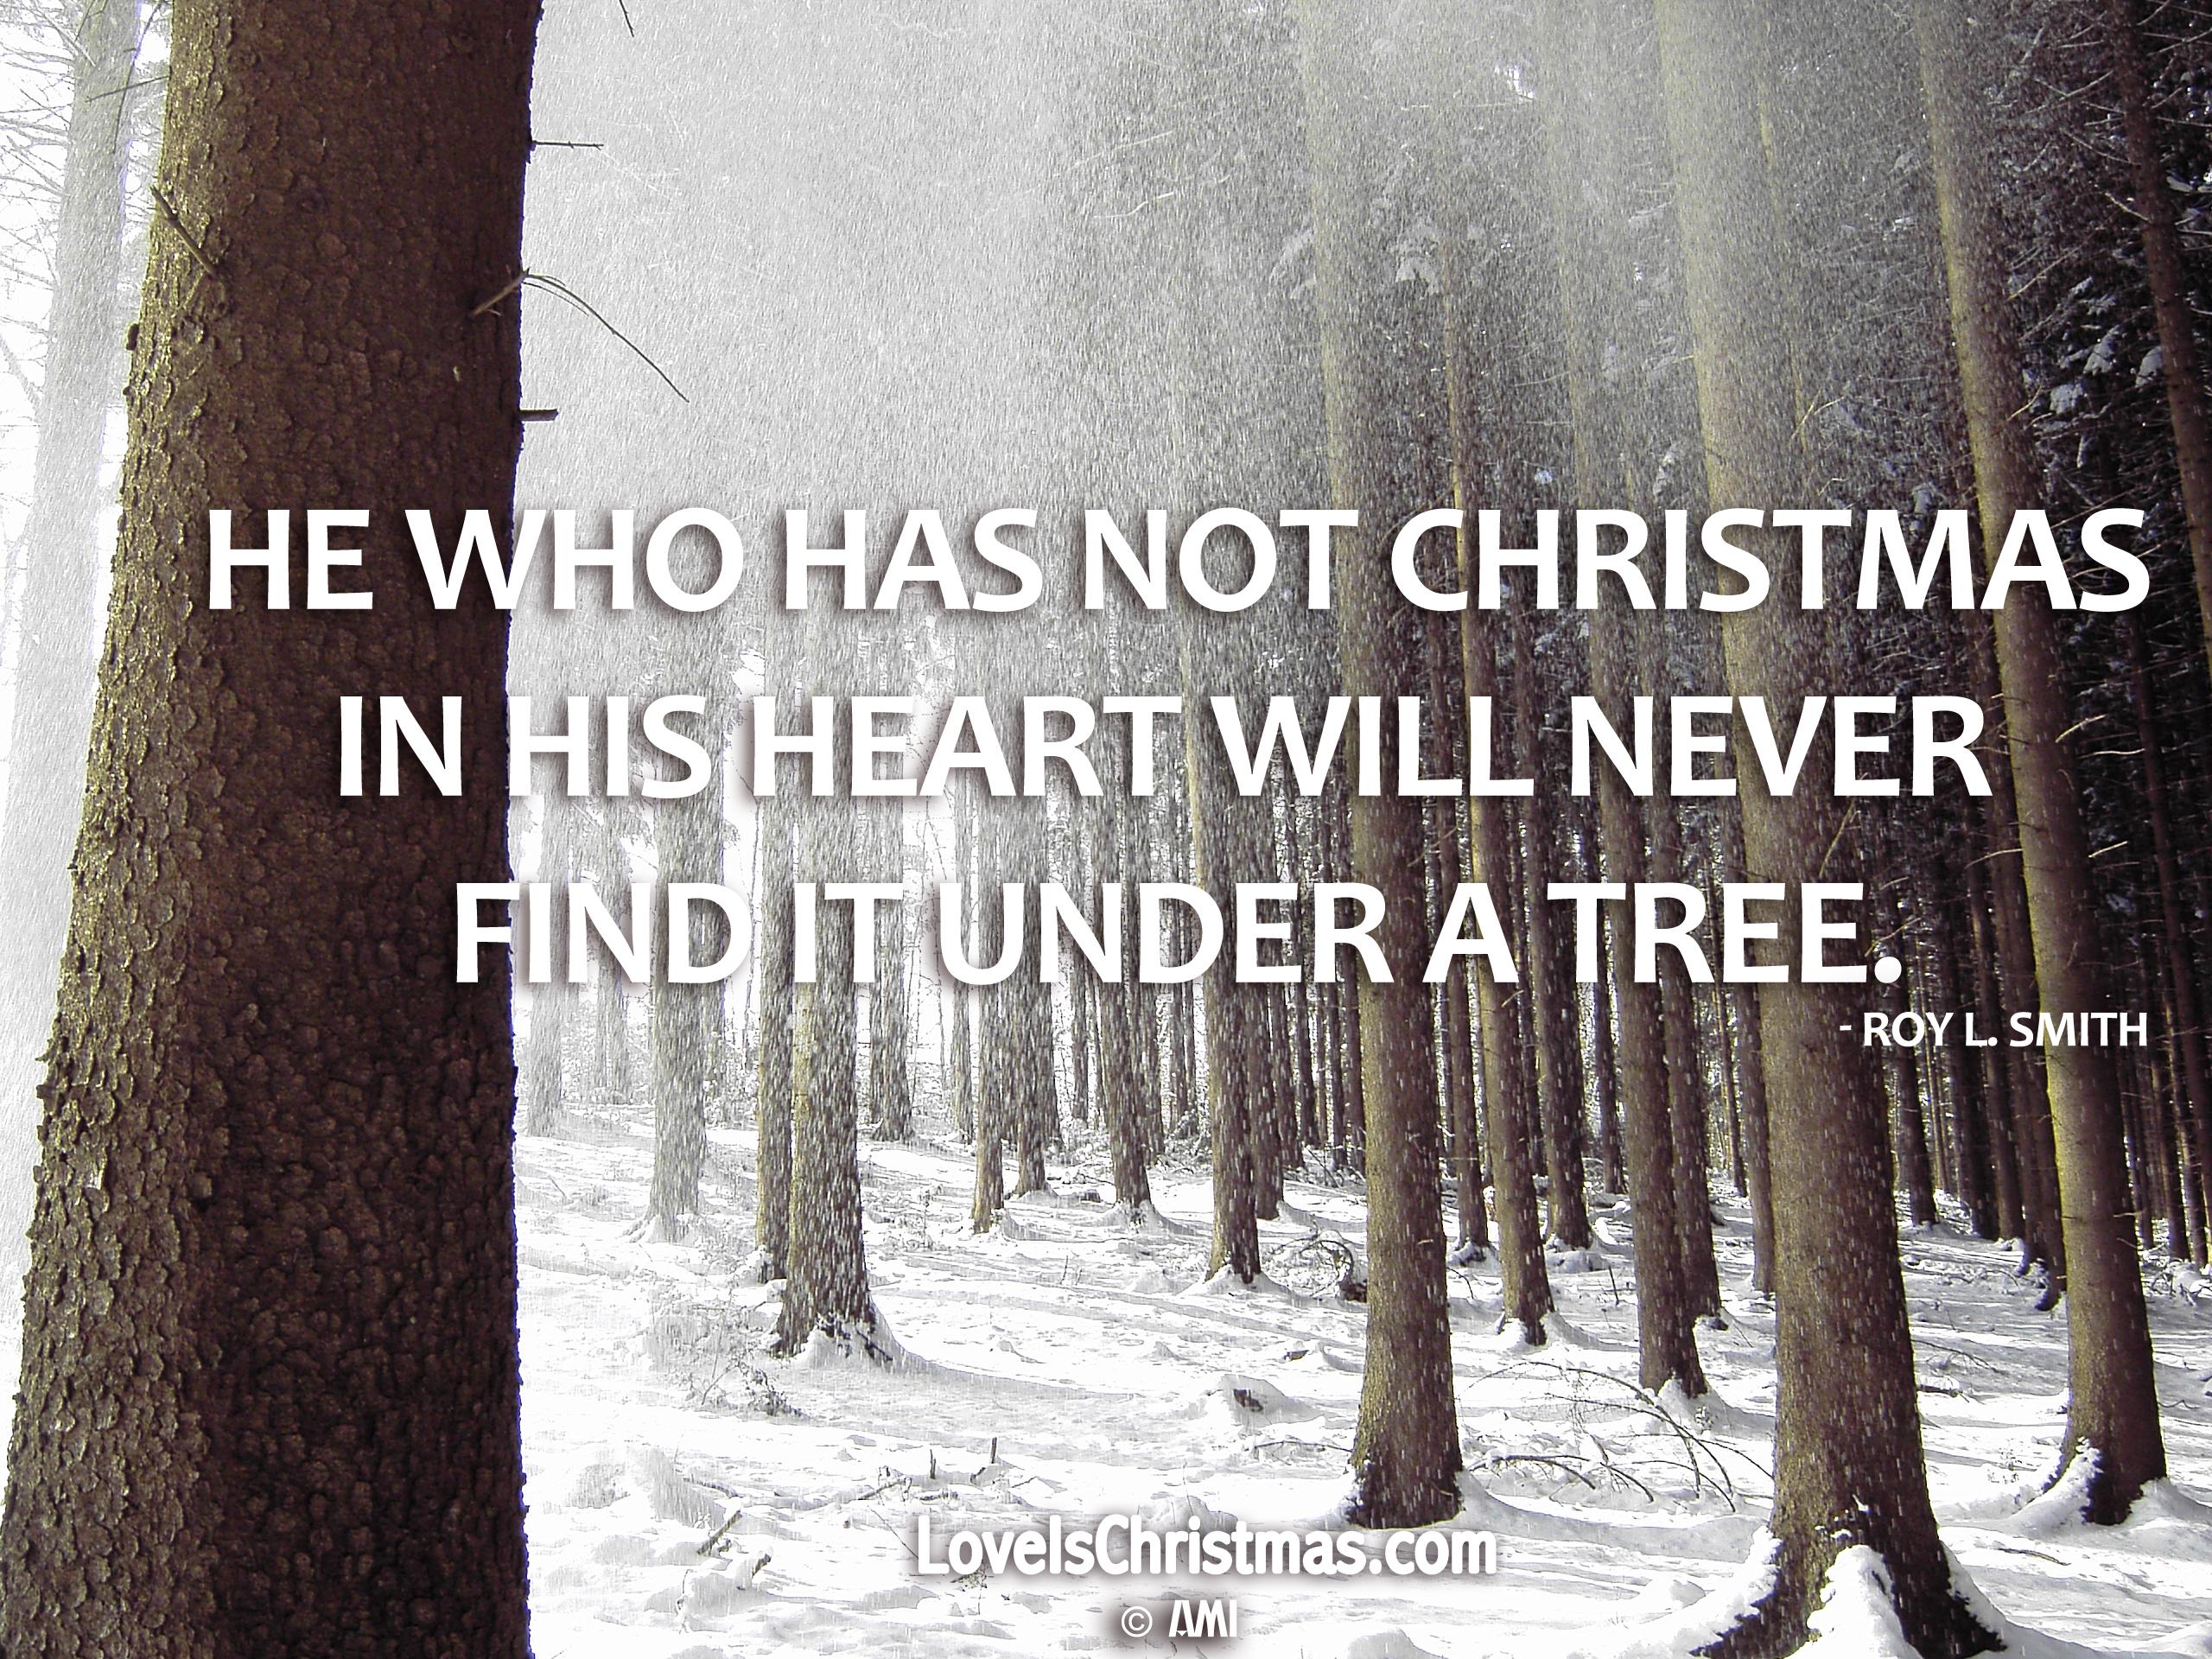 Christmas Trees AMI